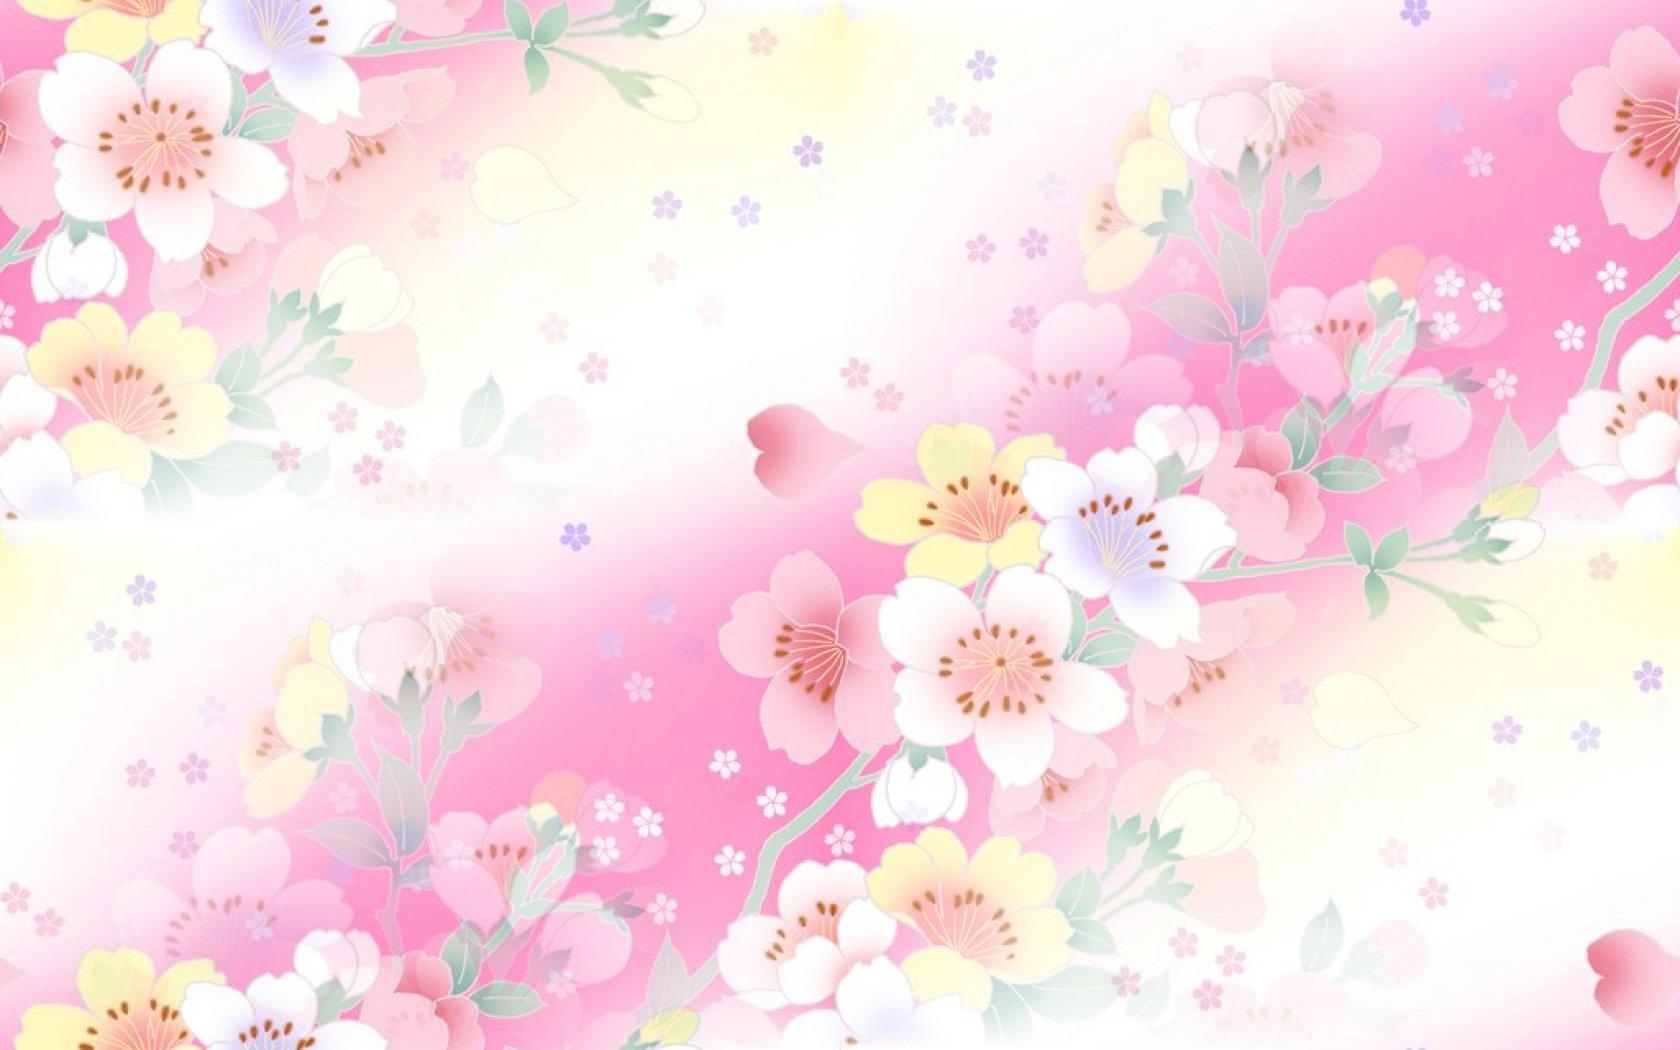 Pretty Flowers Backgrounds - WallpaperSafari